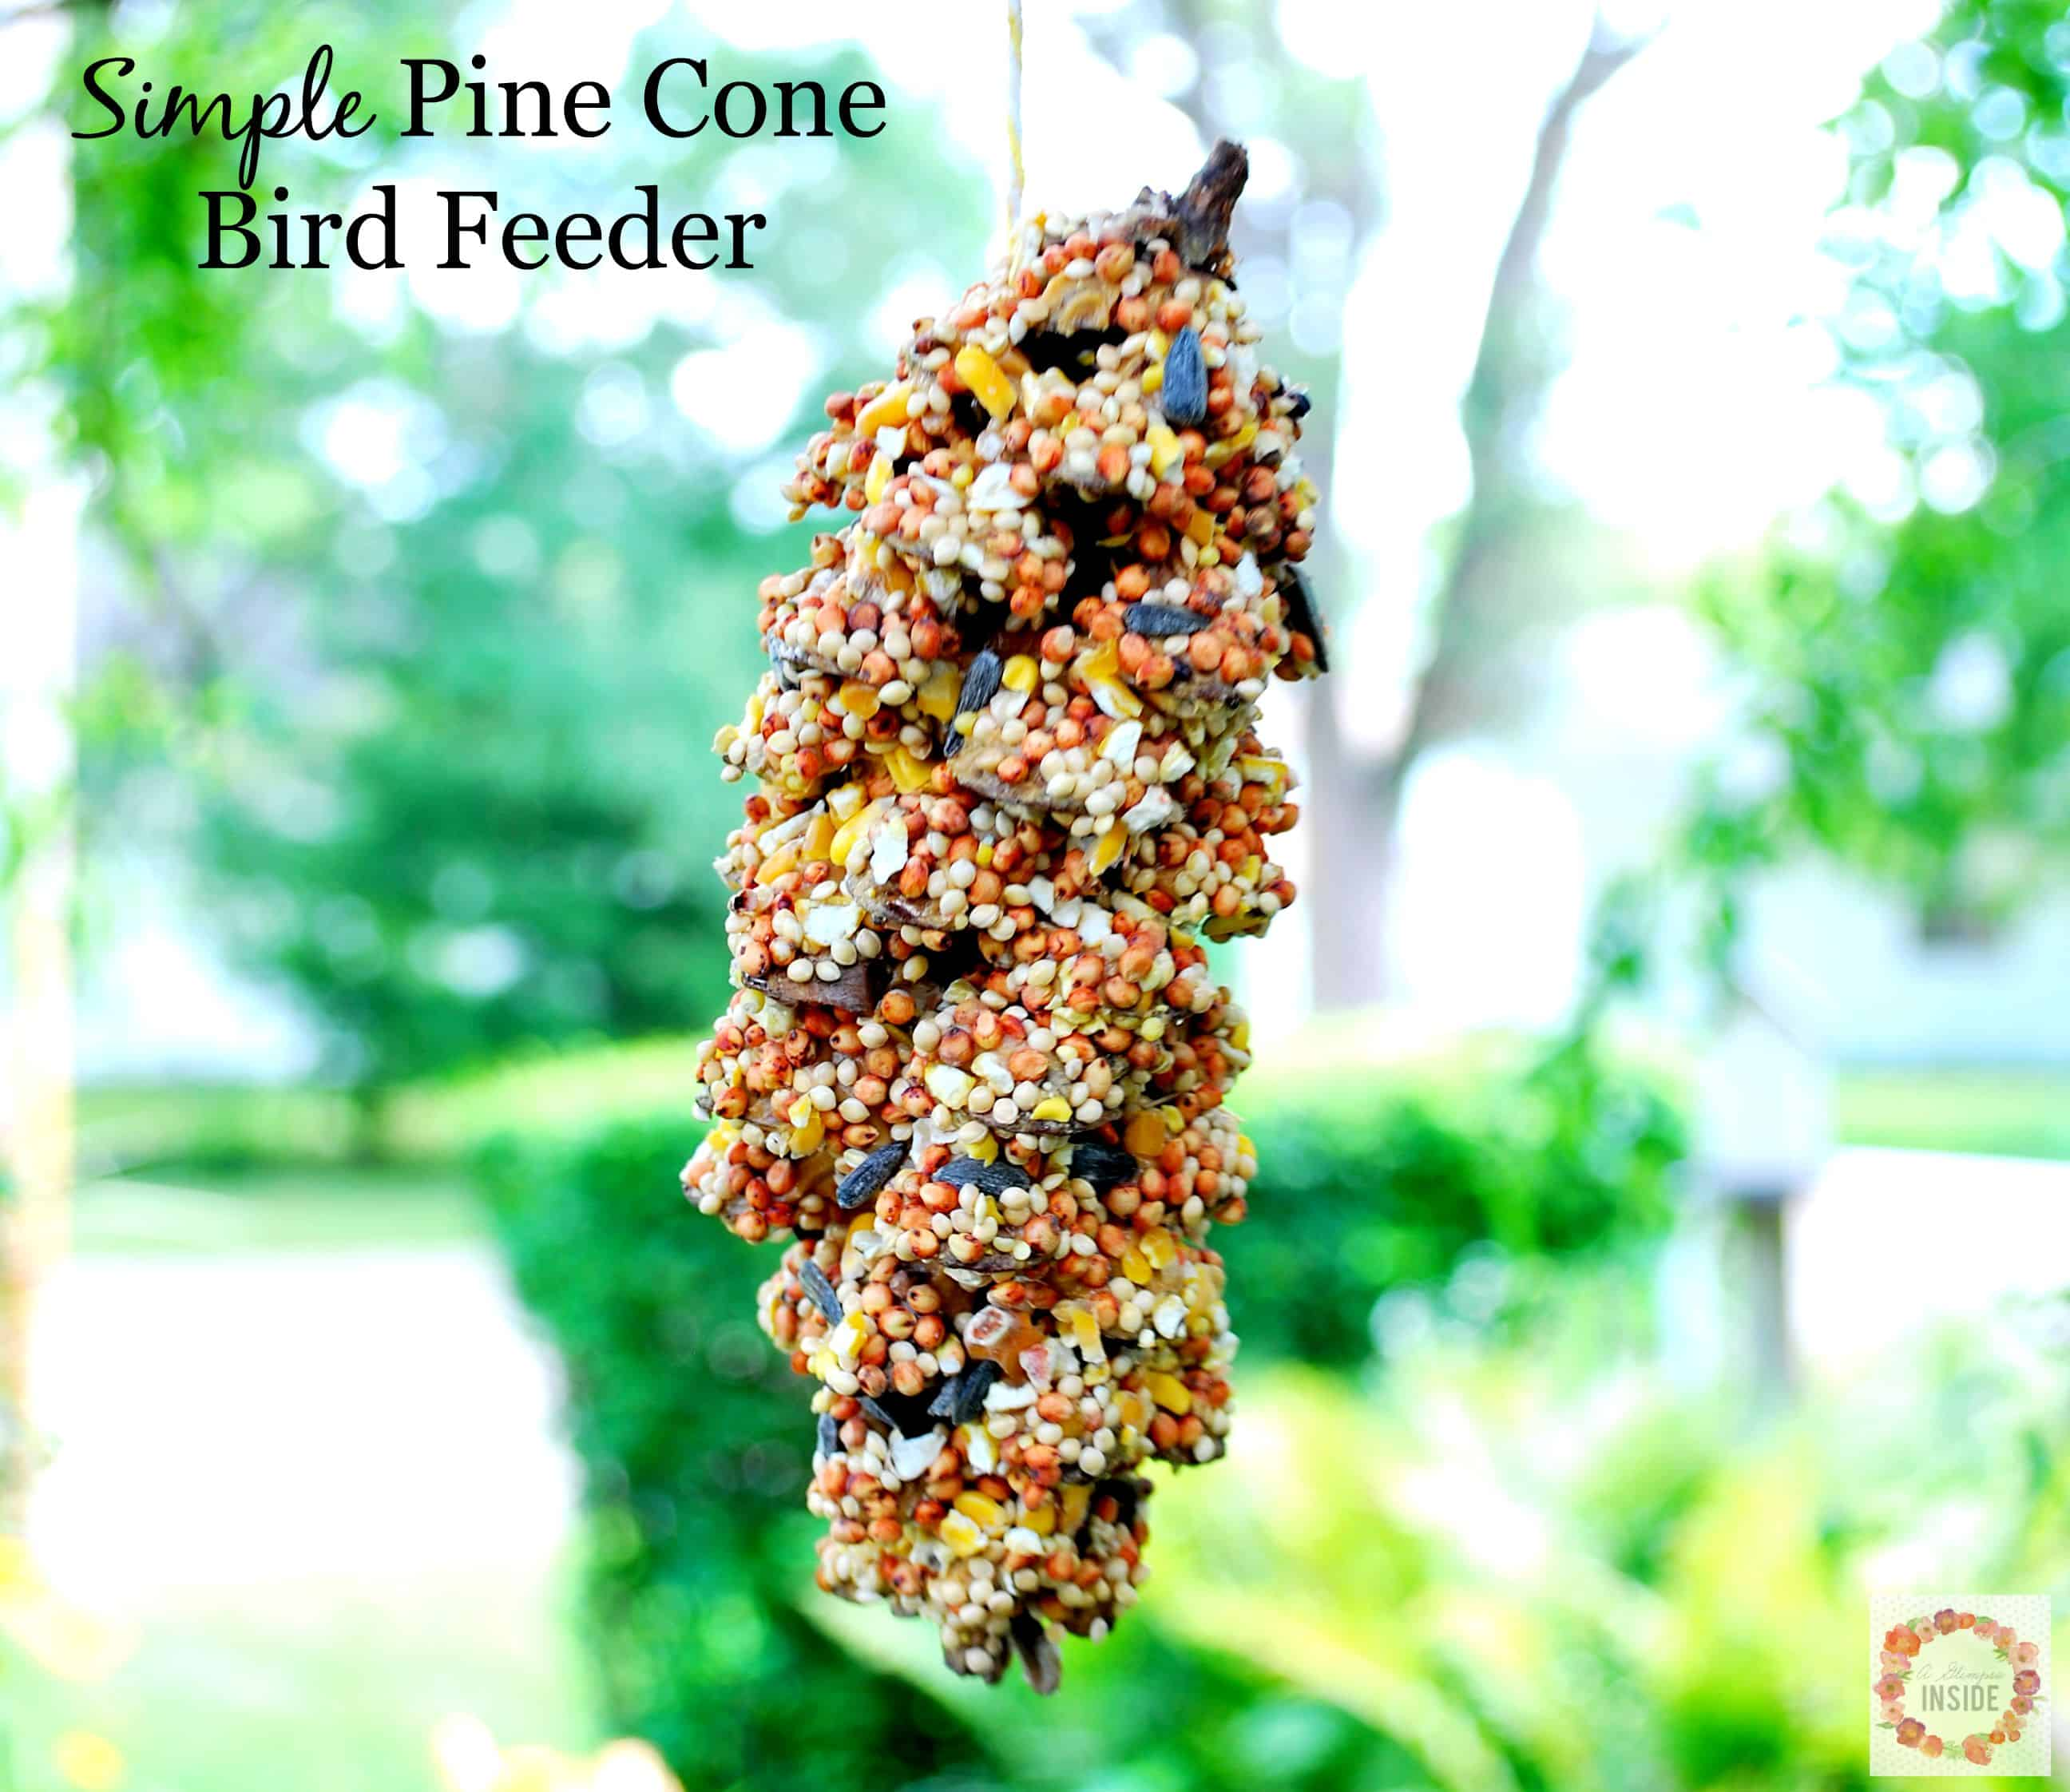 Simple Pine Cone Bird Feeder